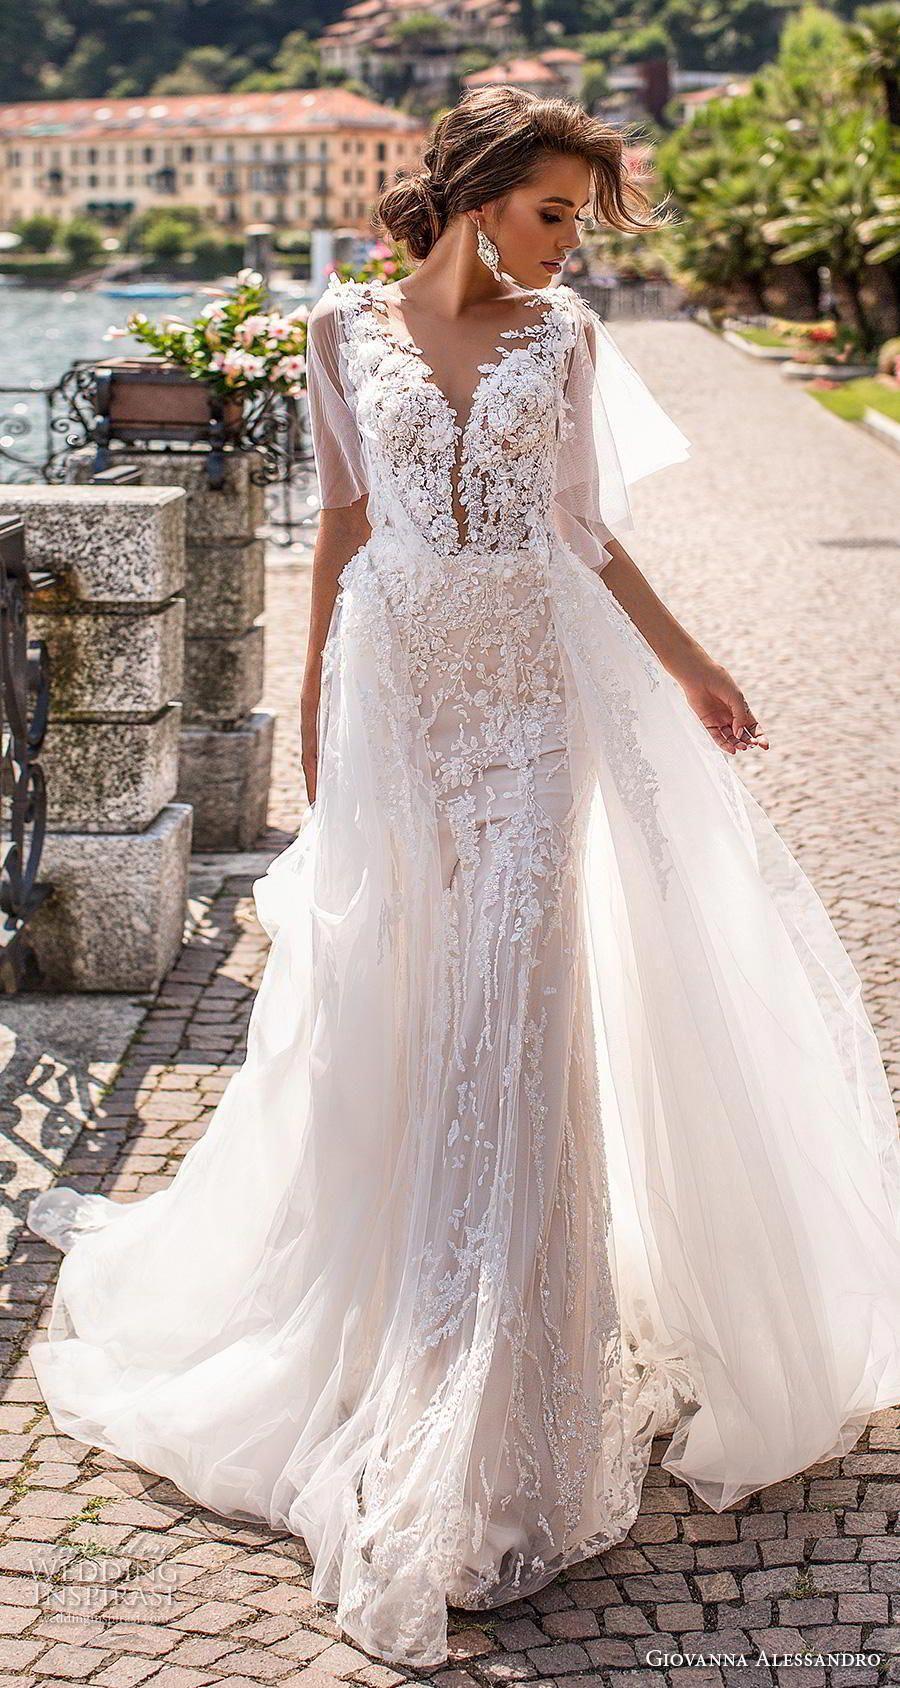 Dresses Dresses Bridal Dresses Wedding Dresses Top Wedding Dress Designers